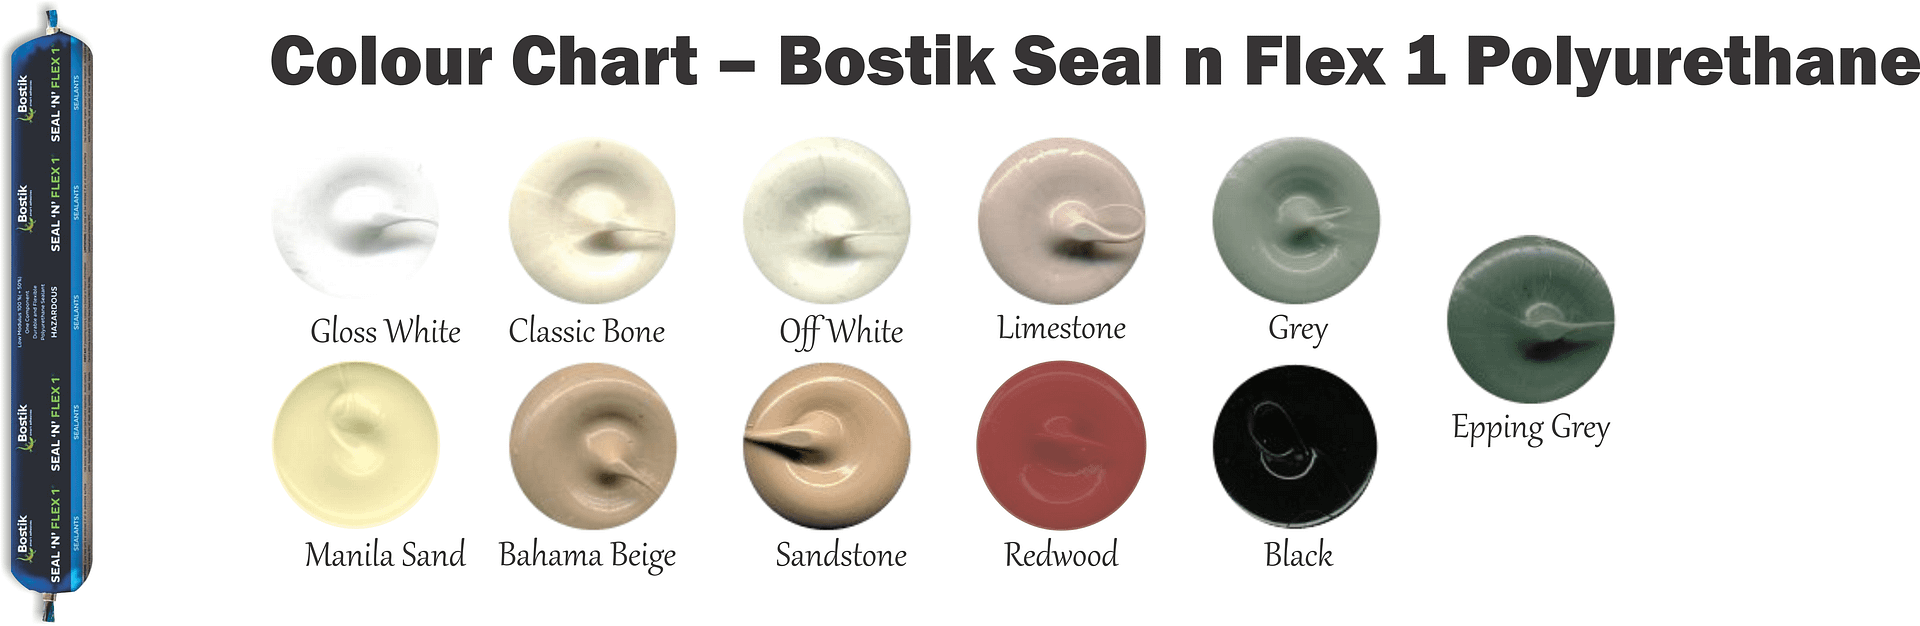 Colour Chart Bostik Seal n Flex 1 Polyurethane